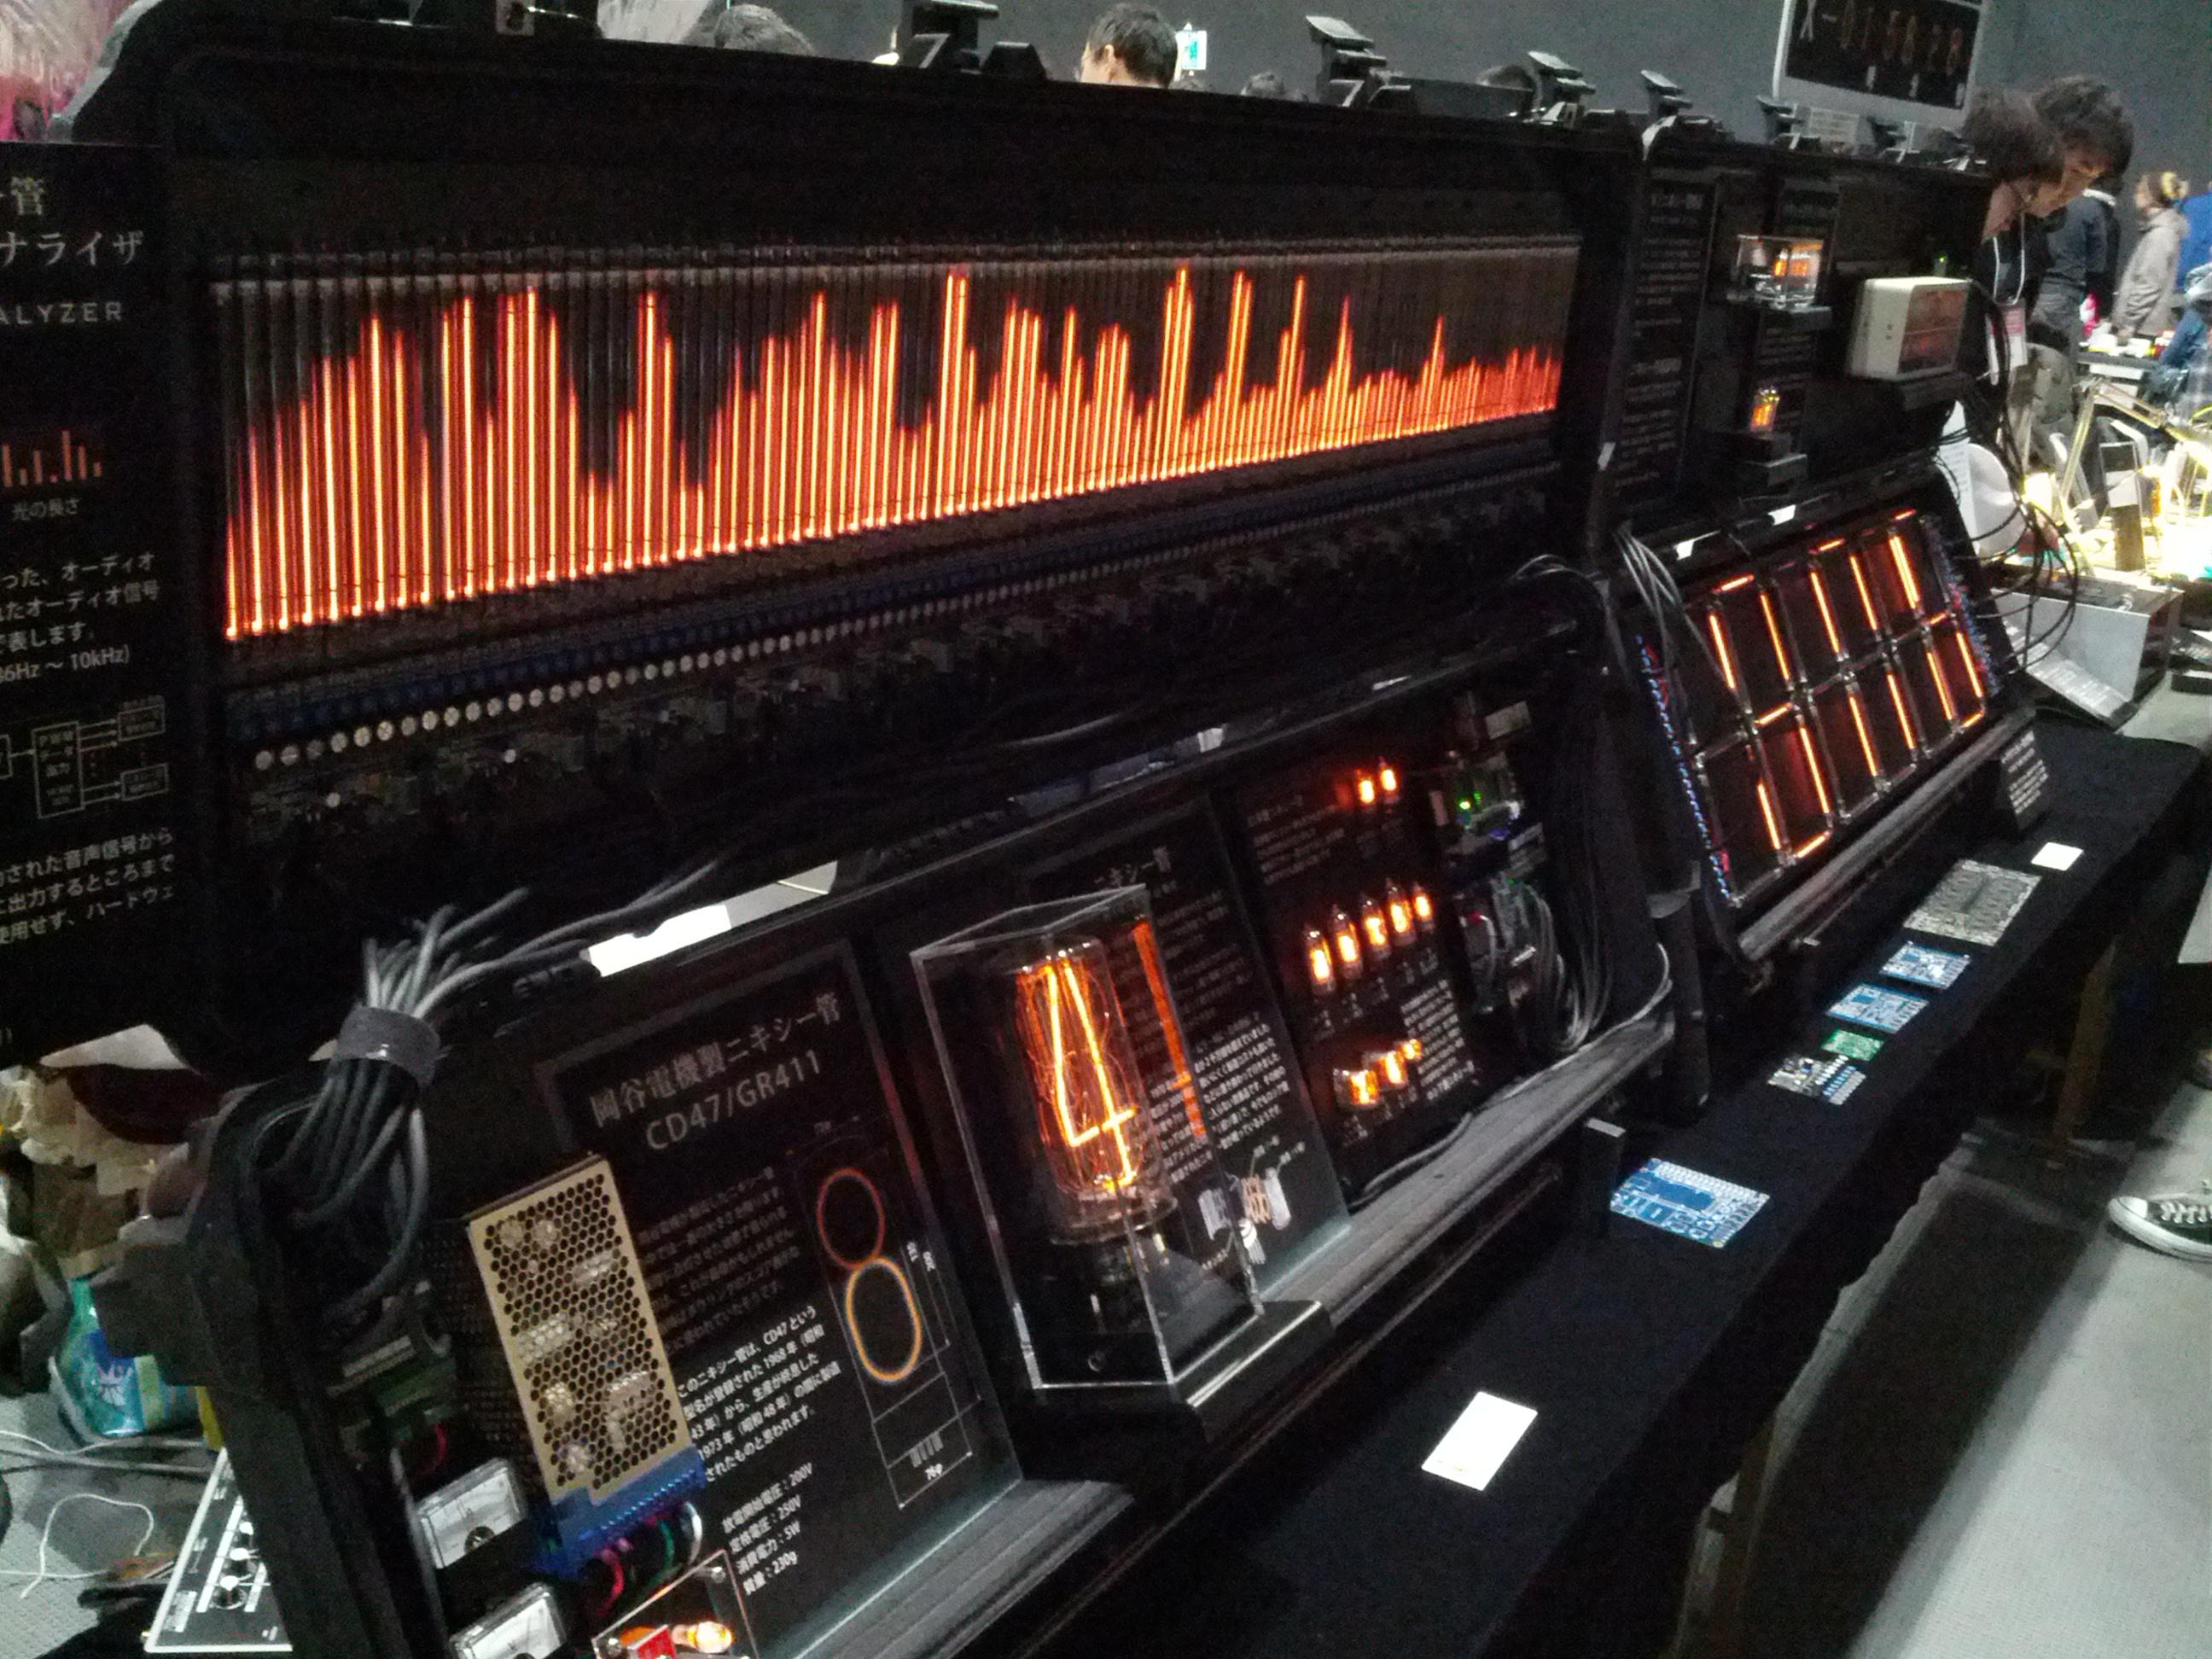 Awesome audio spectrum analyzer using TONS of nixie tubes @yuna_digick (yuna.digick.jp).